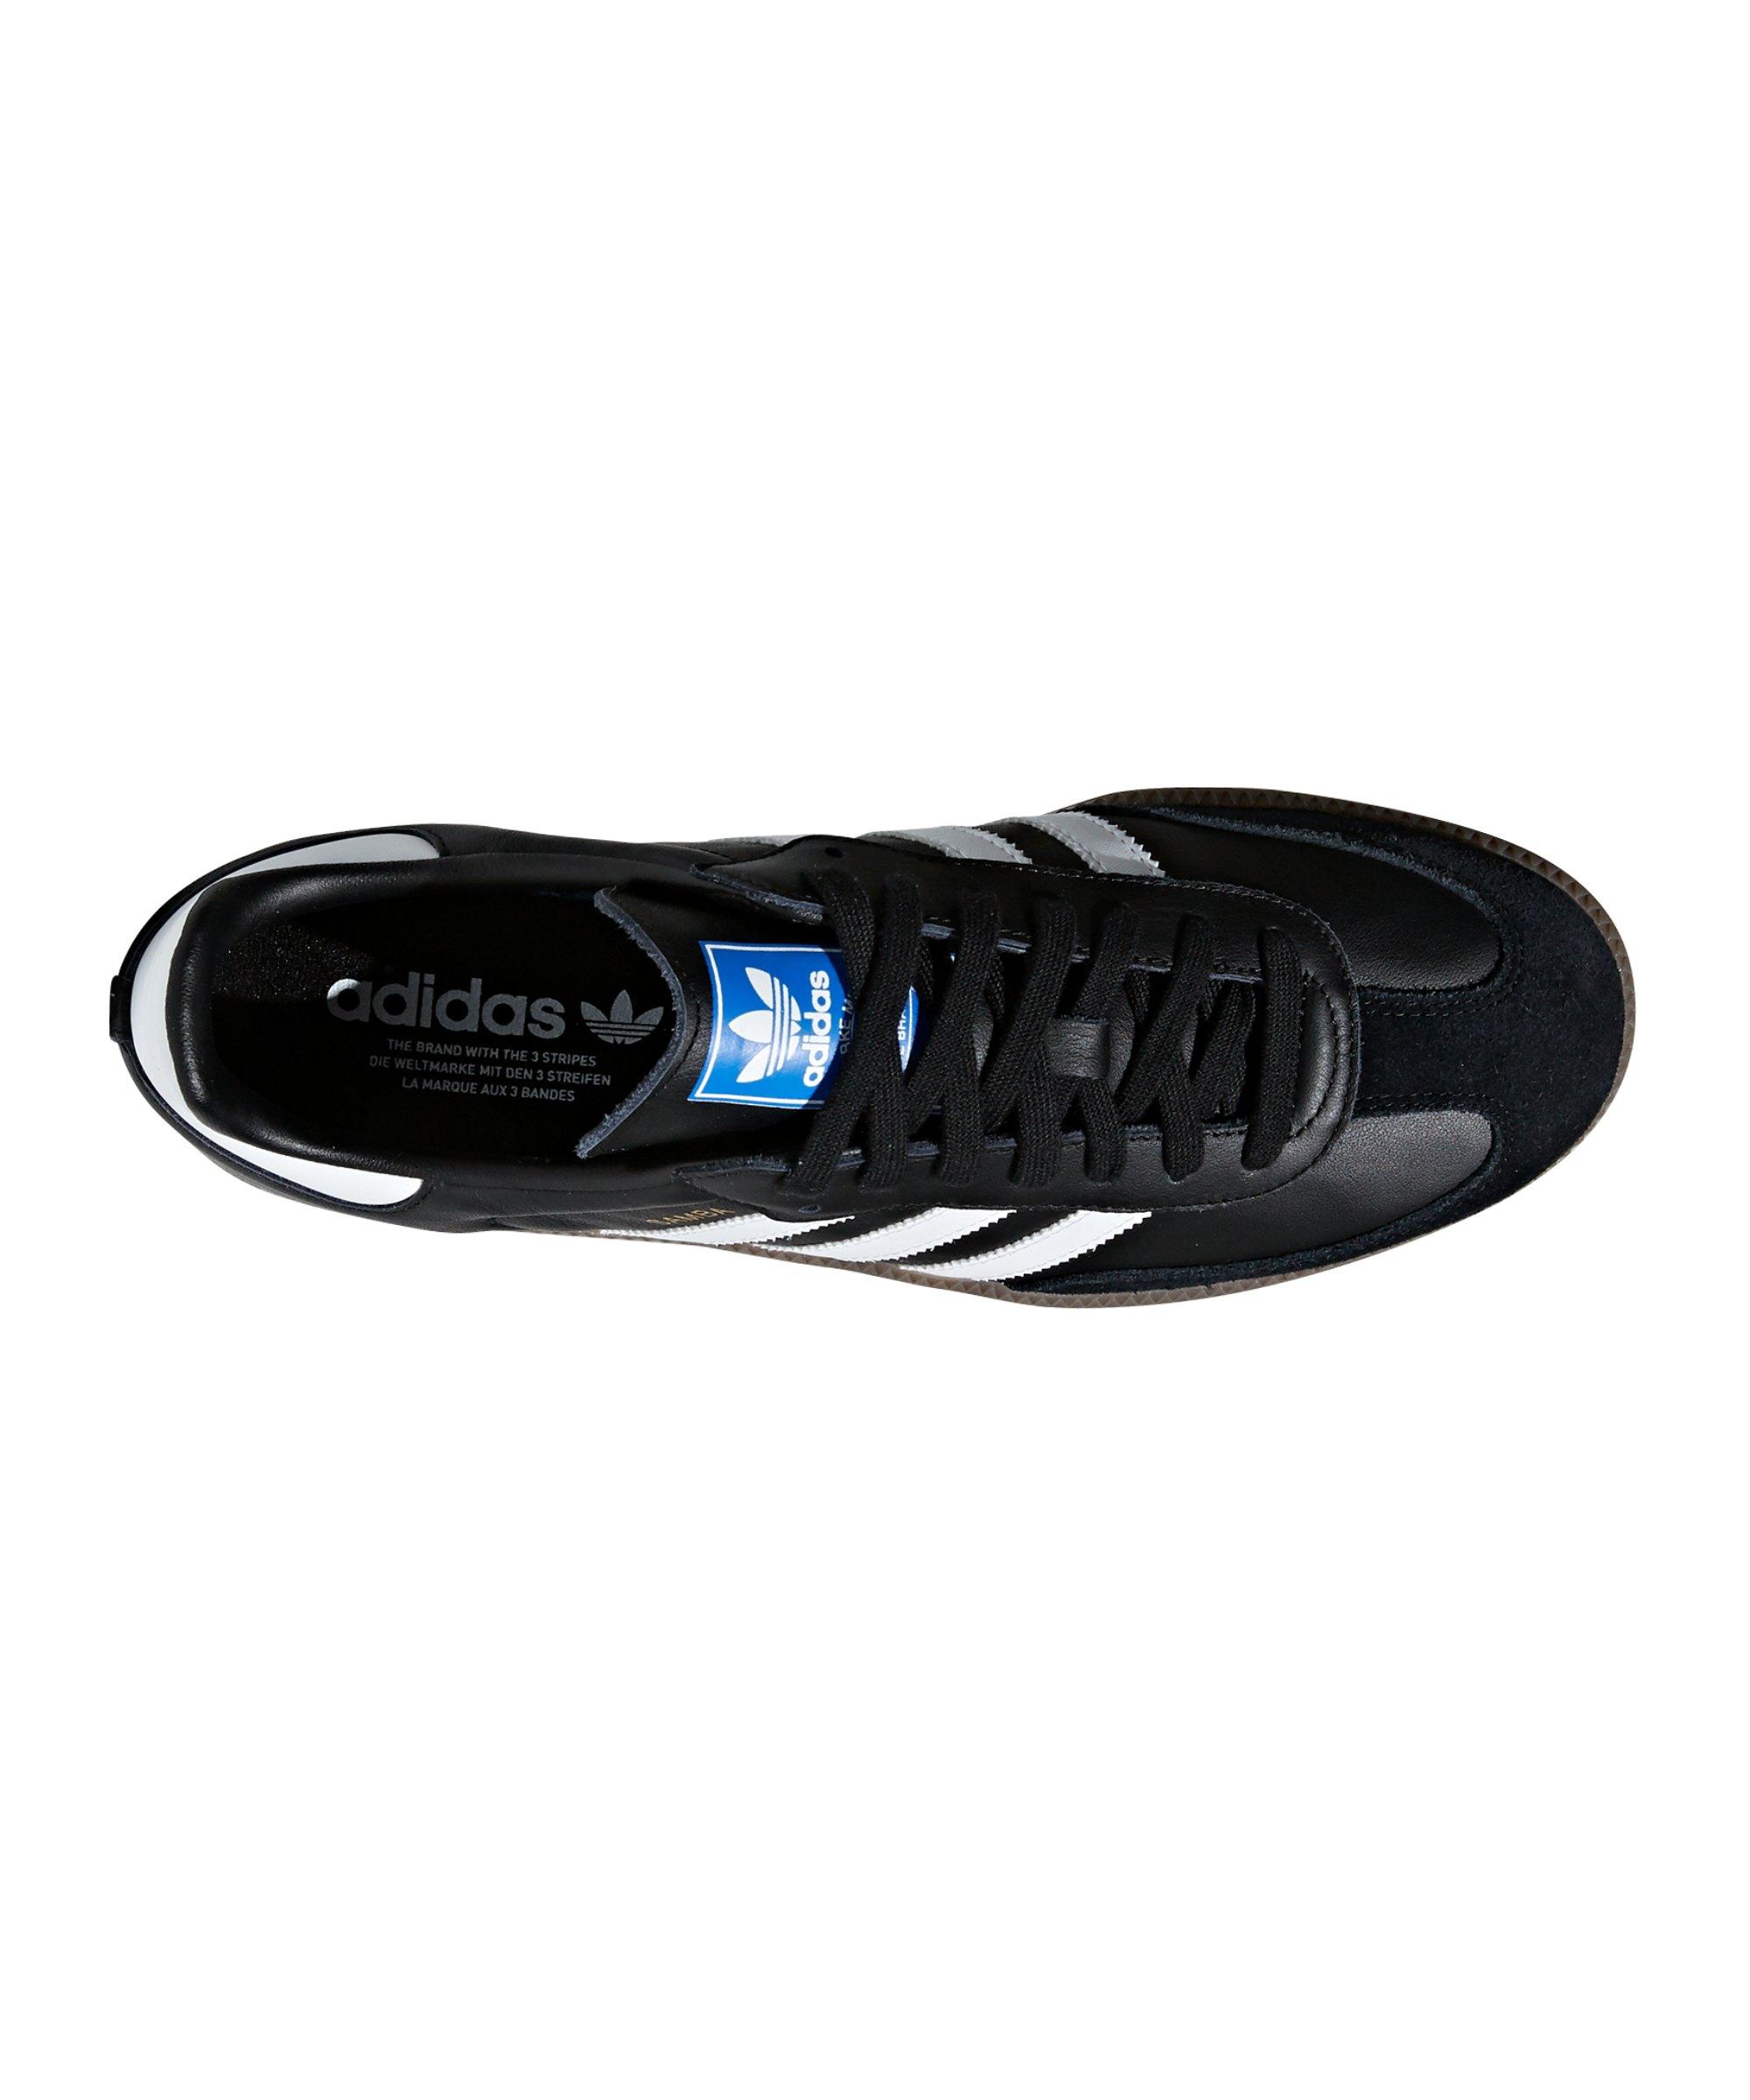 Originals Adidas Weiss Samba Schwarz Og K1J3TclF